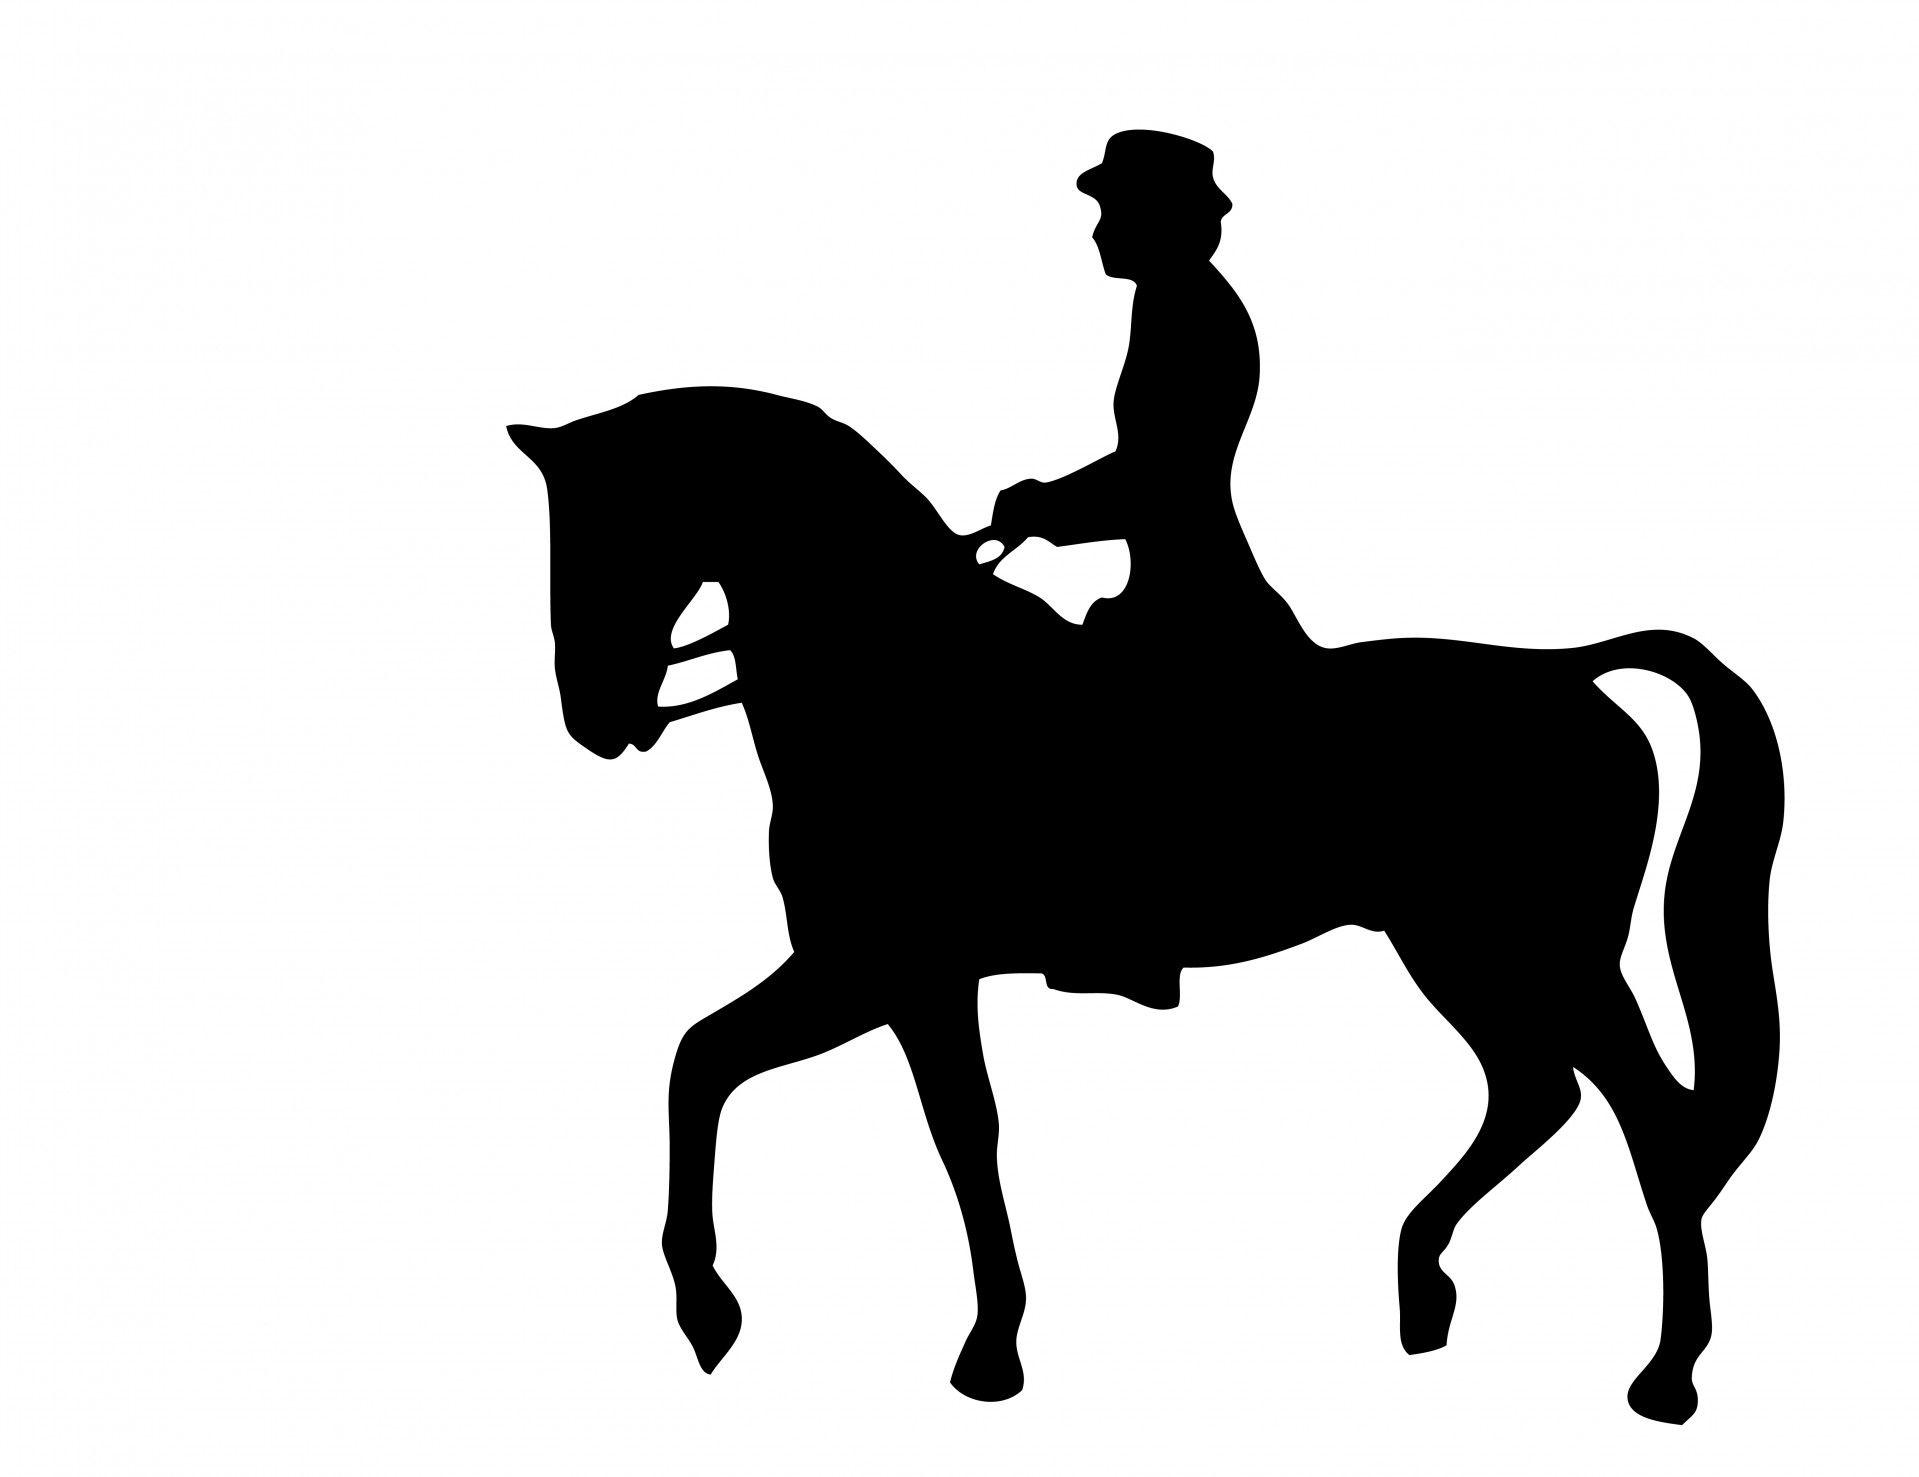 Horse Riding Silhouette | Horse Rider Si-horse riding Silhouette | Horse Rider Silhouette Clipart Free Stock Photo  HD - Public Domain .-12